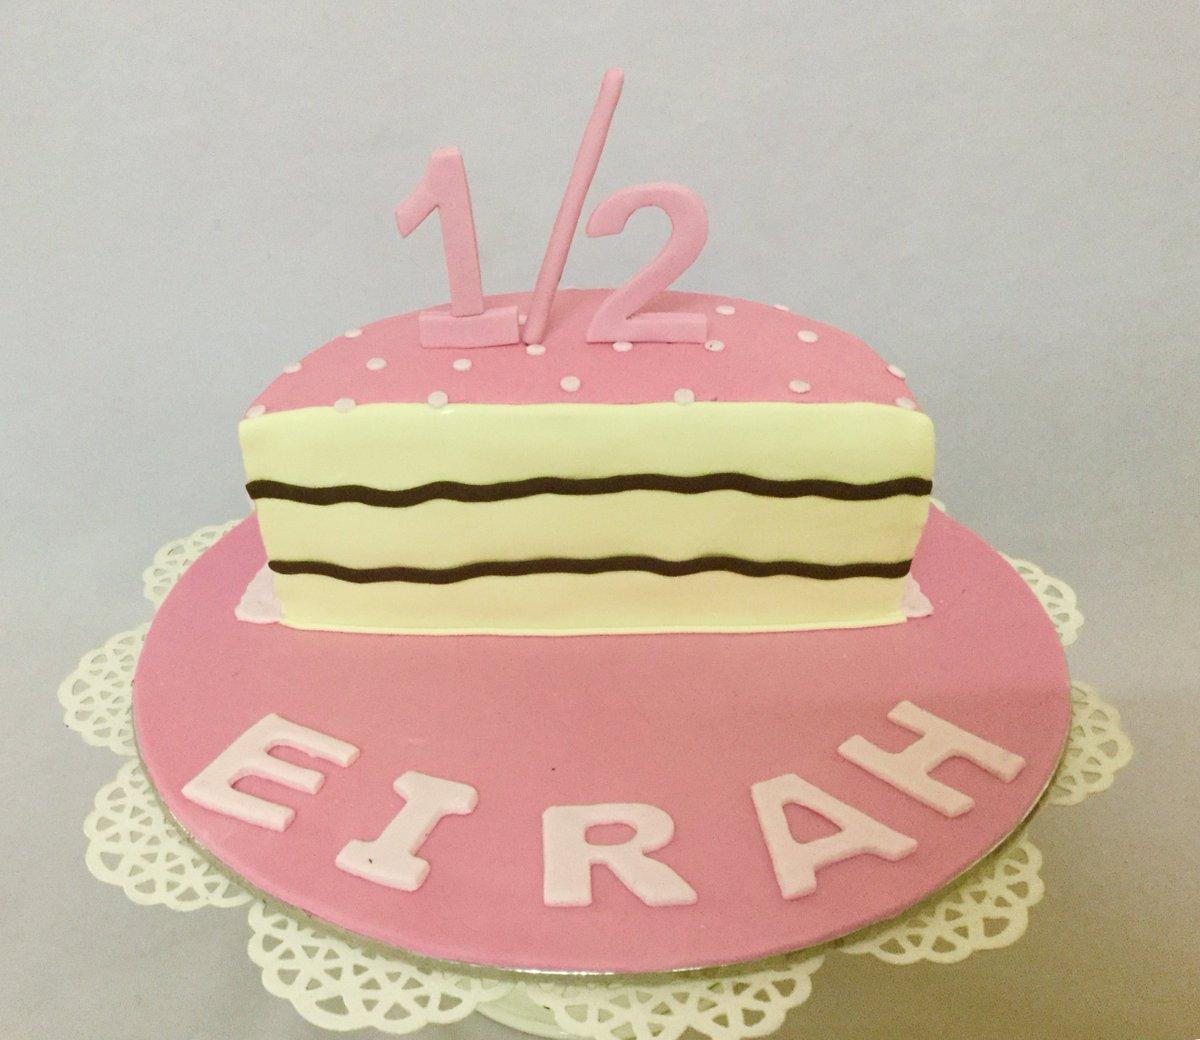 Little Eirah Celebrated Her 6 Months Birthday With This Cute Pink Cake Halfbirthdaycake 6monthsbirthdaycake Girlbirthdaycake Babybirthdaycake